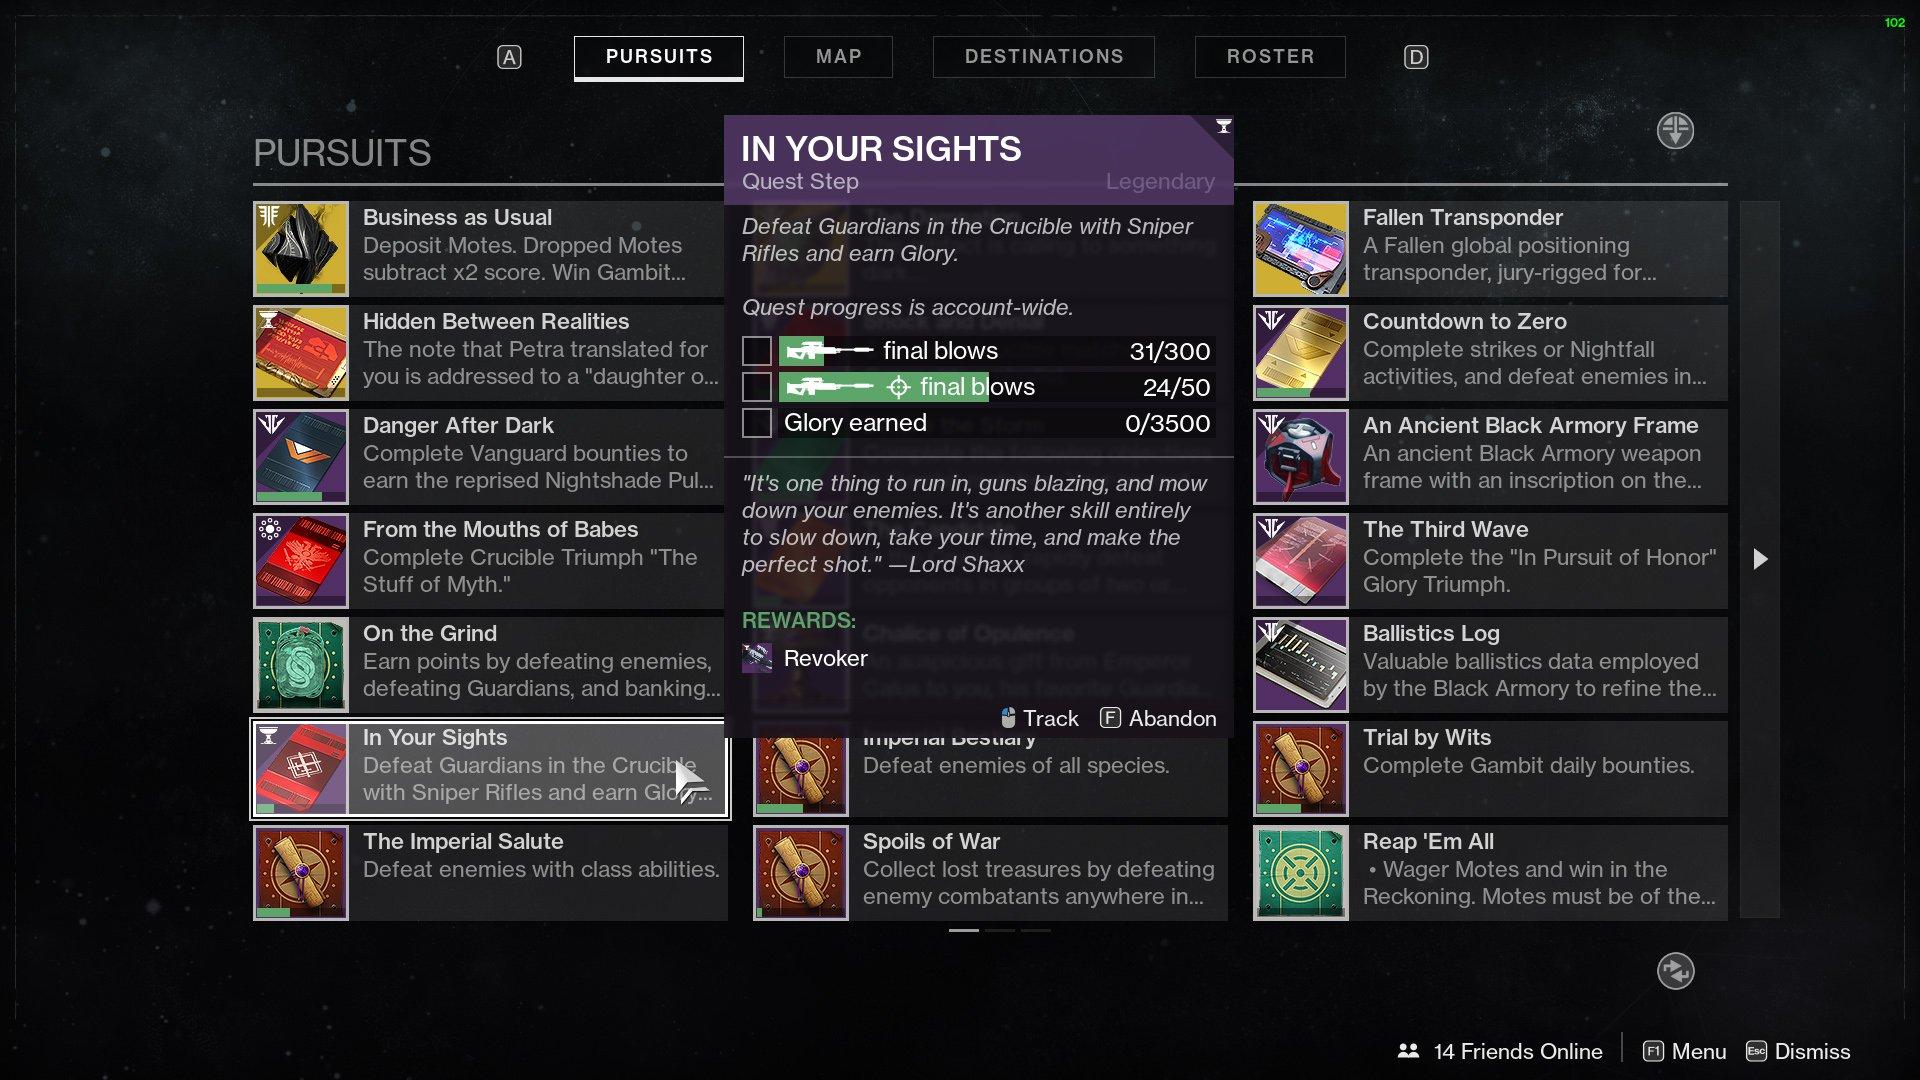 How to get Revoker Pinnacle weapon in Destiny 2 | Shacknews